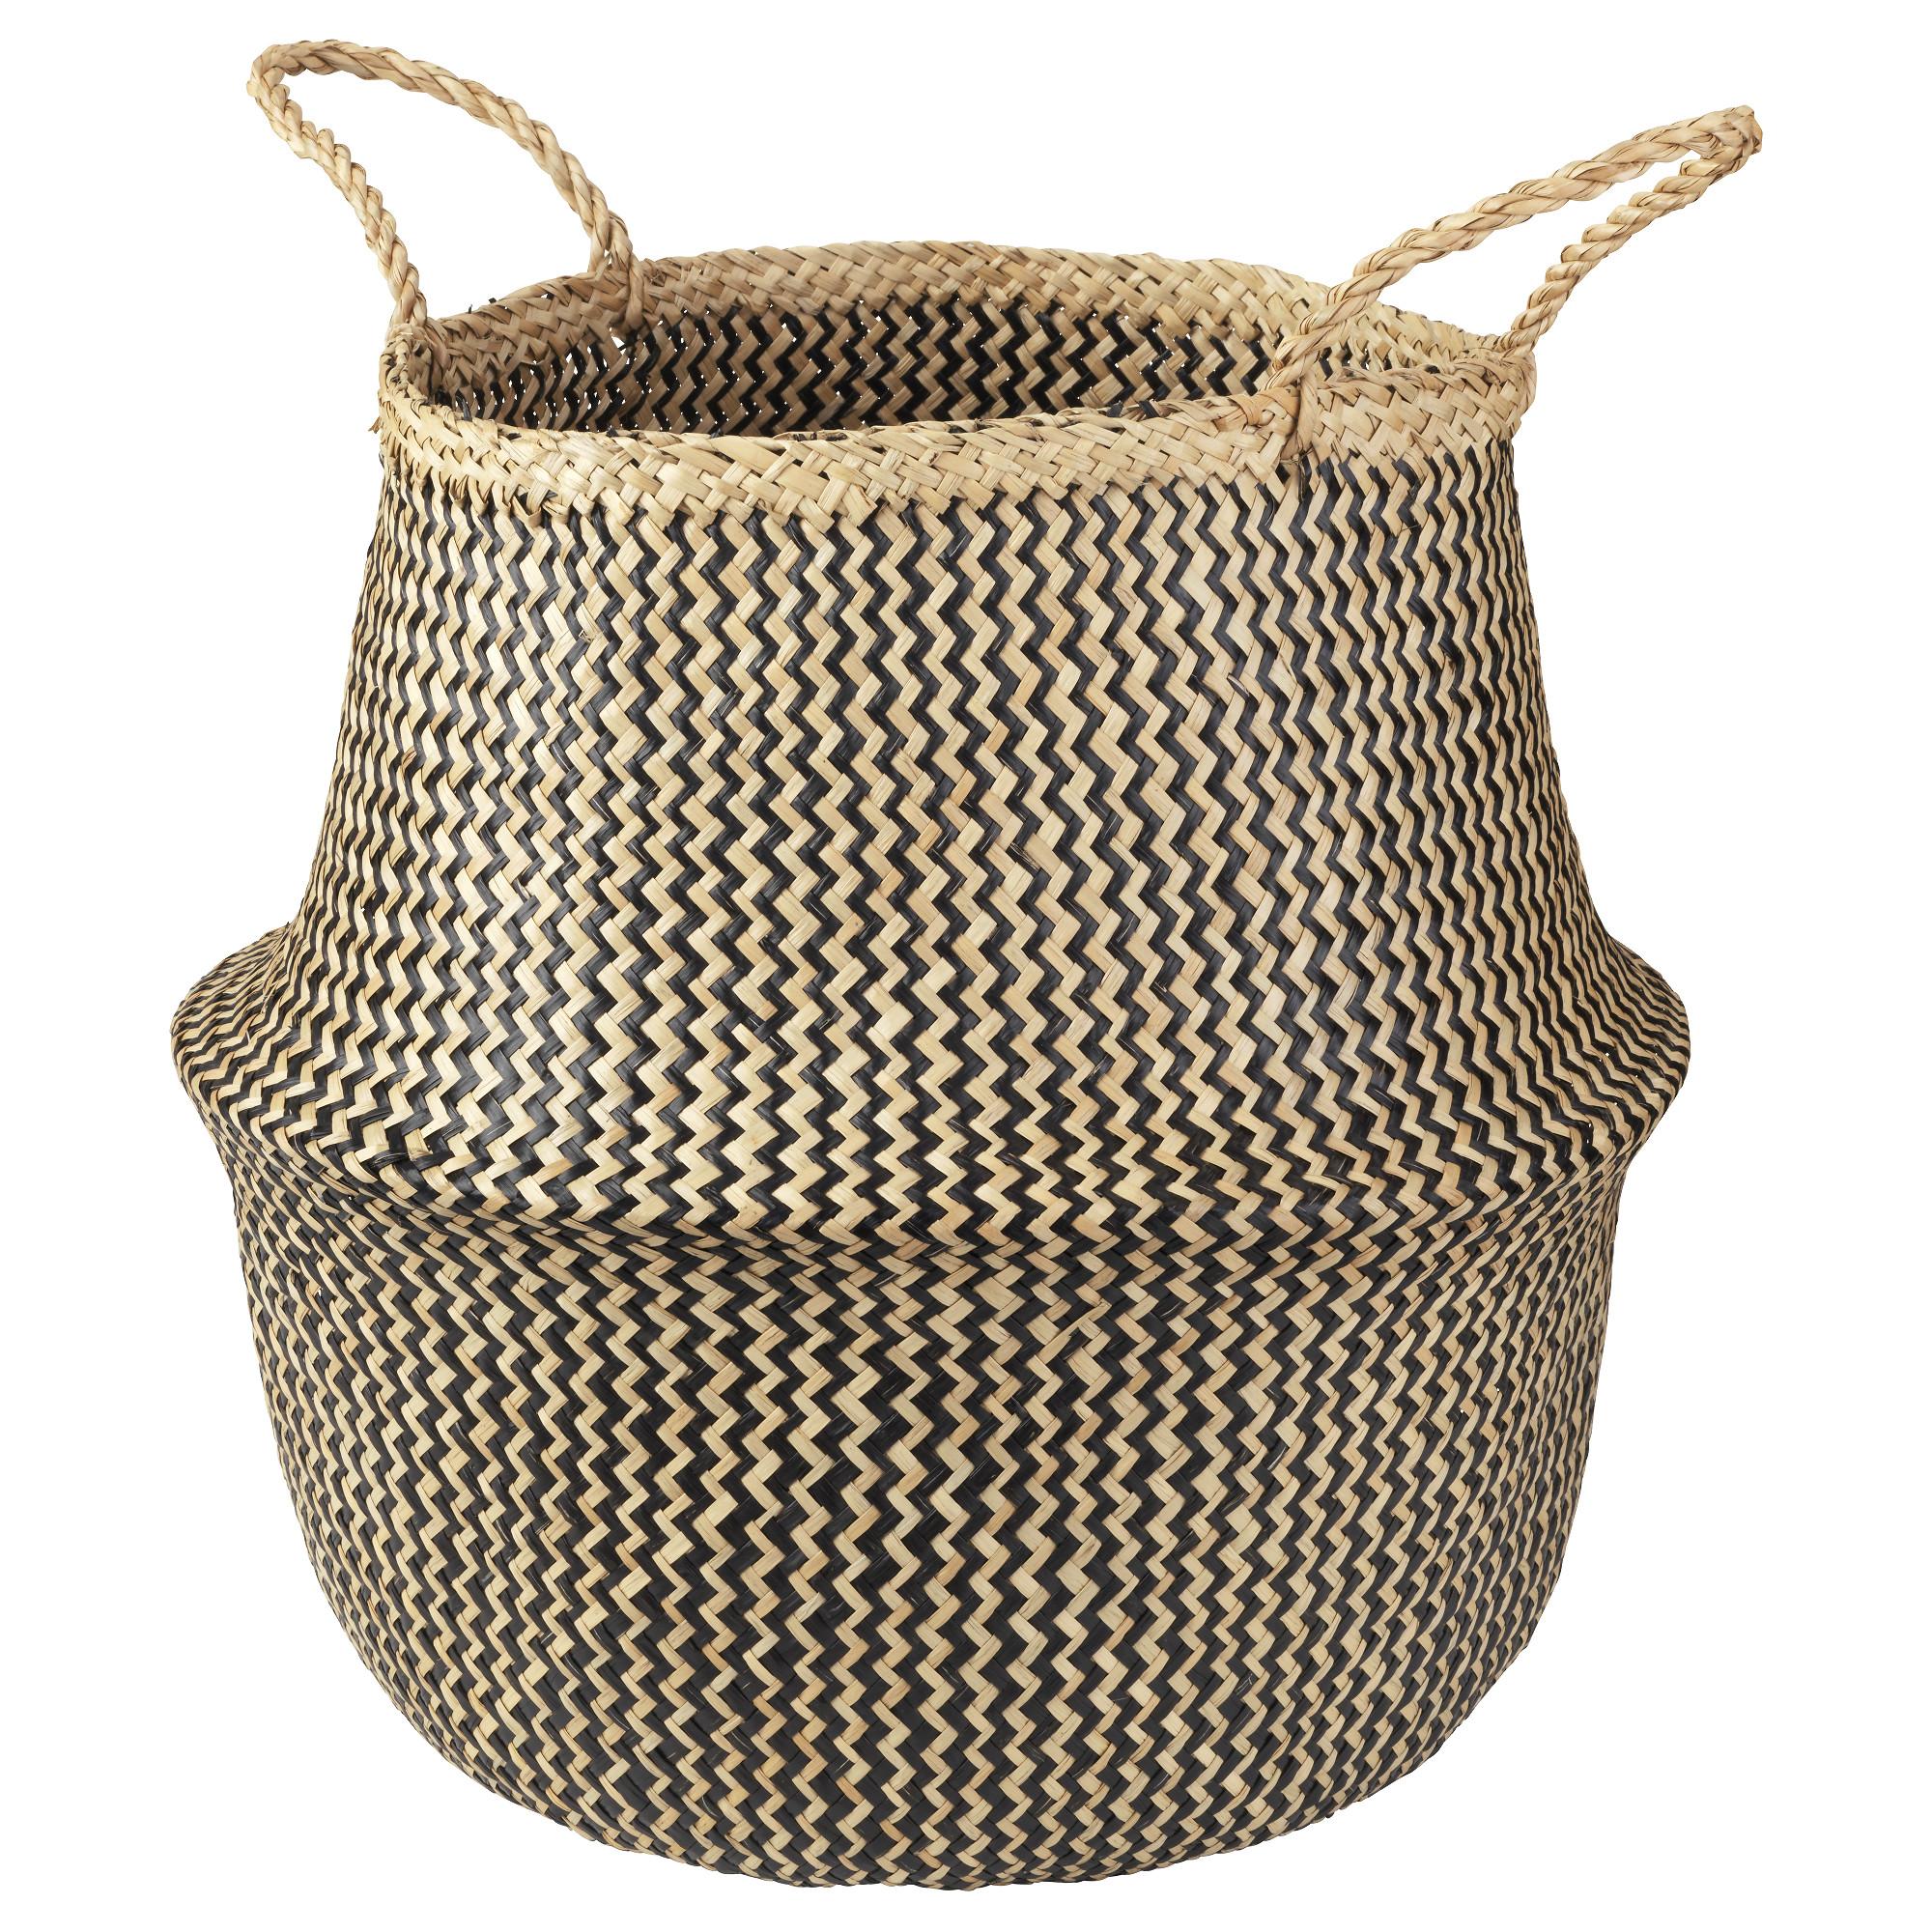 FlÅDIS basket - Seagrass, Black, $19.99